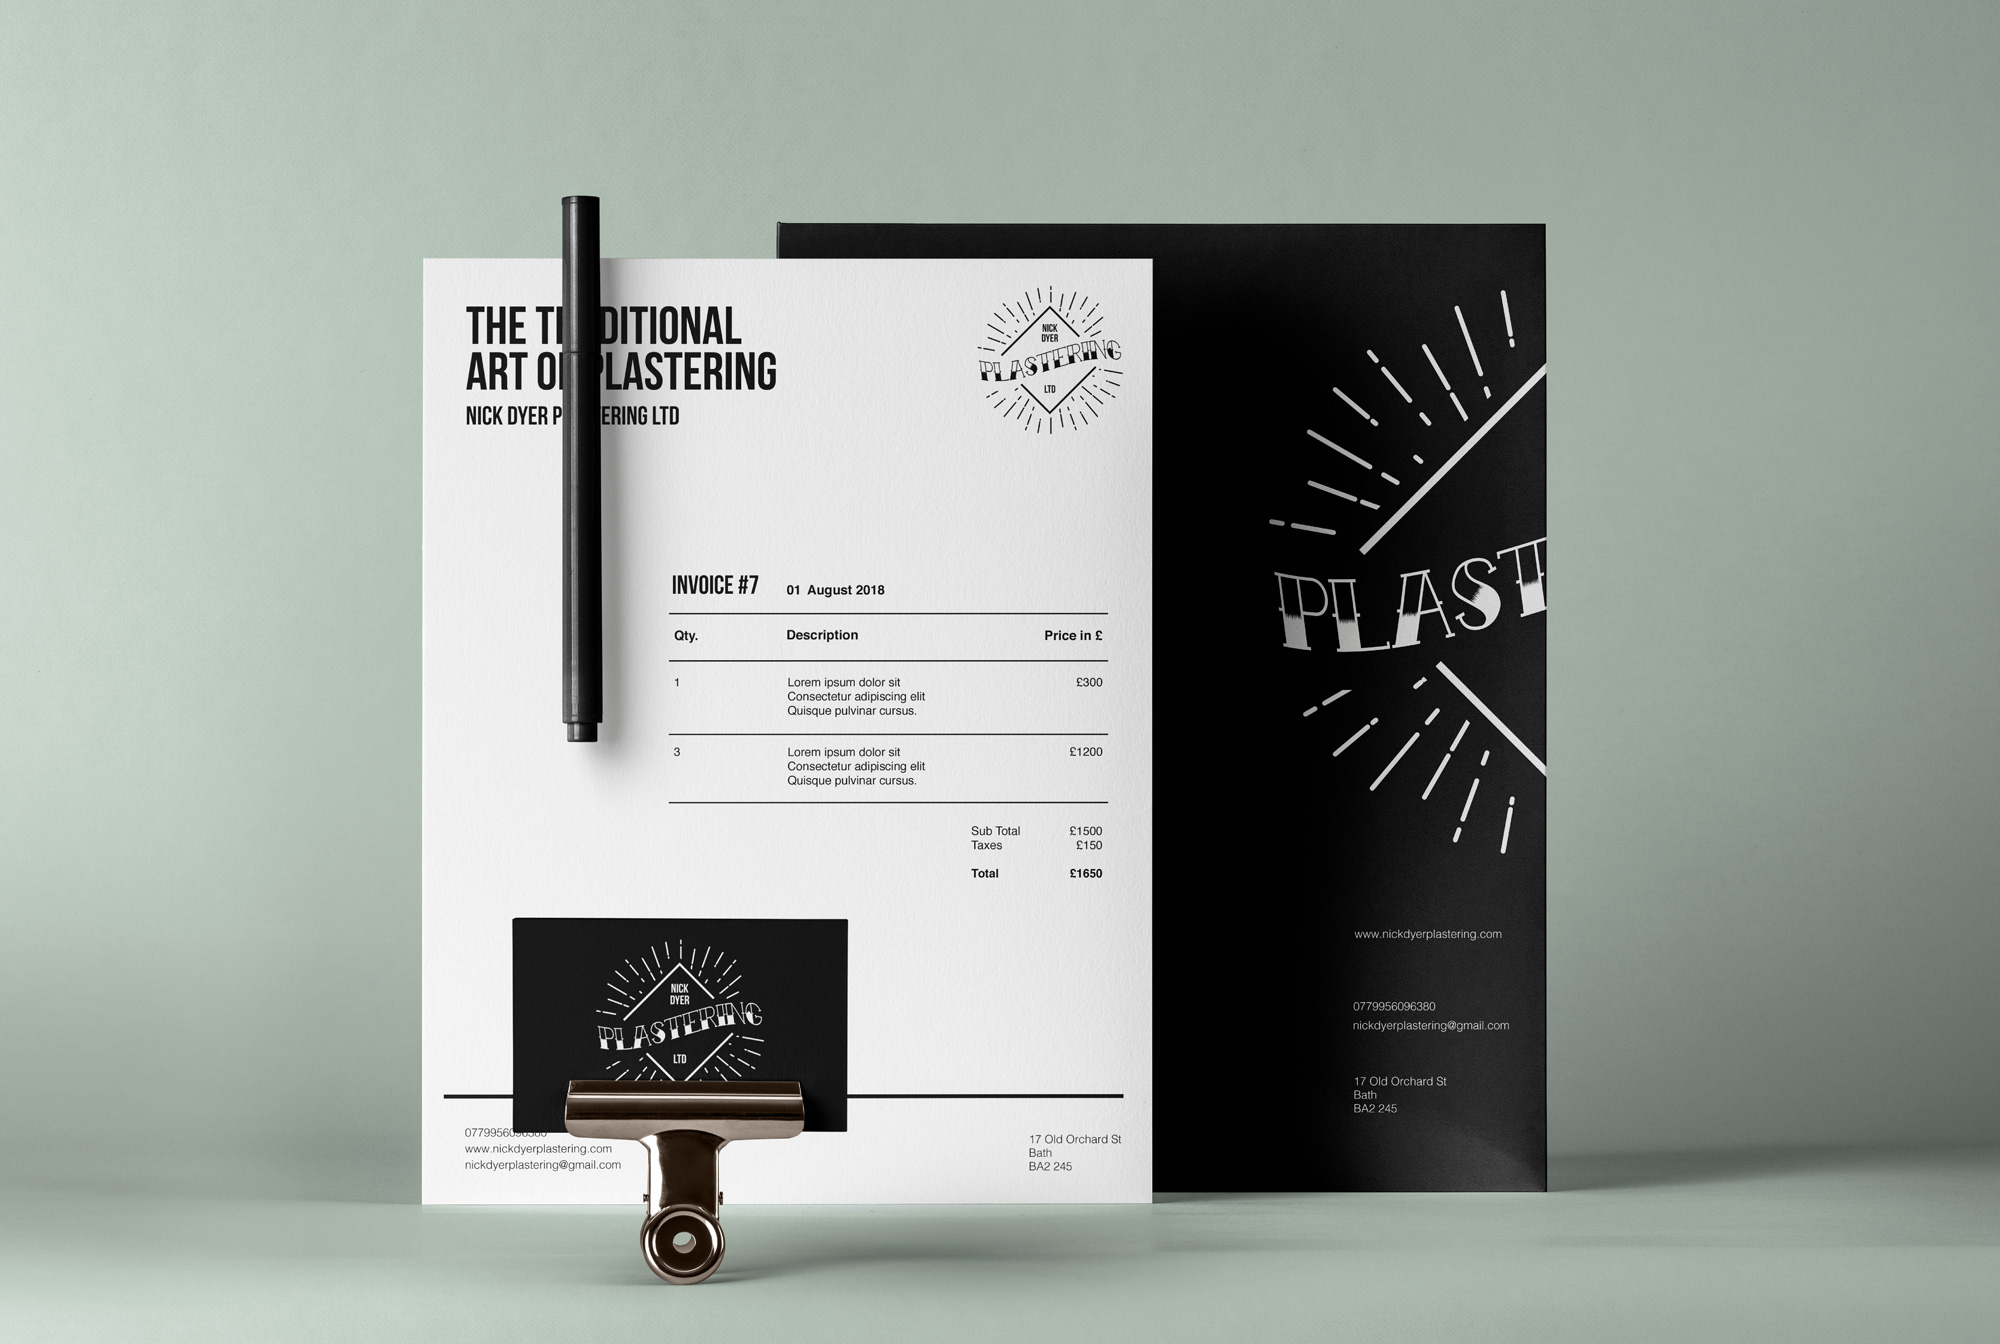 Plastering-Builder-Logo_-Van-Livery-Design_Brand-Identity_Invoice-Design